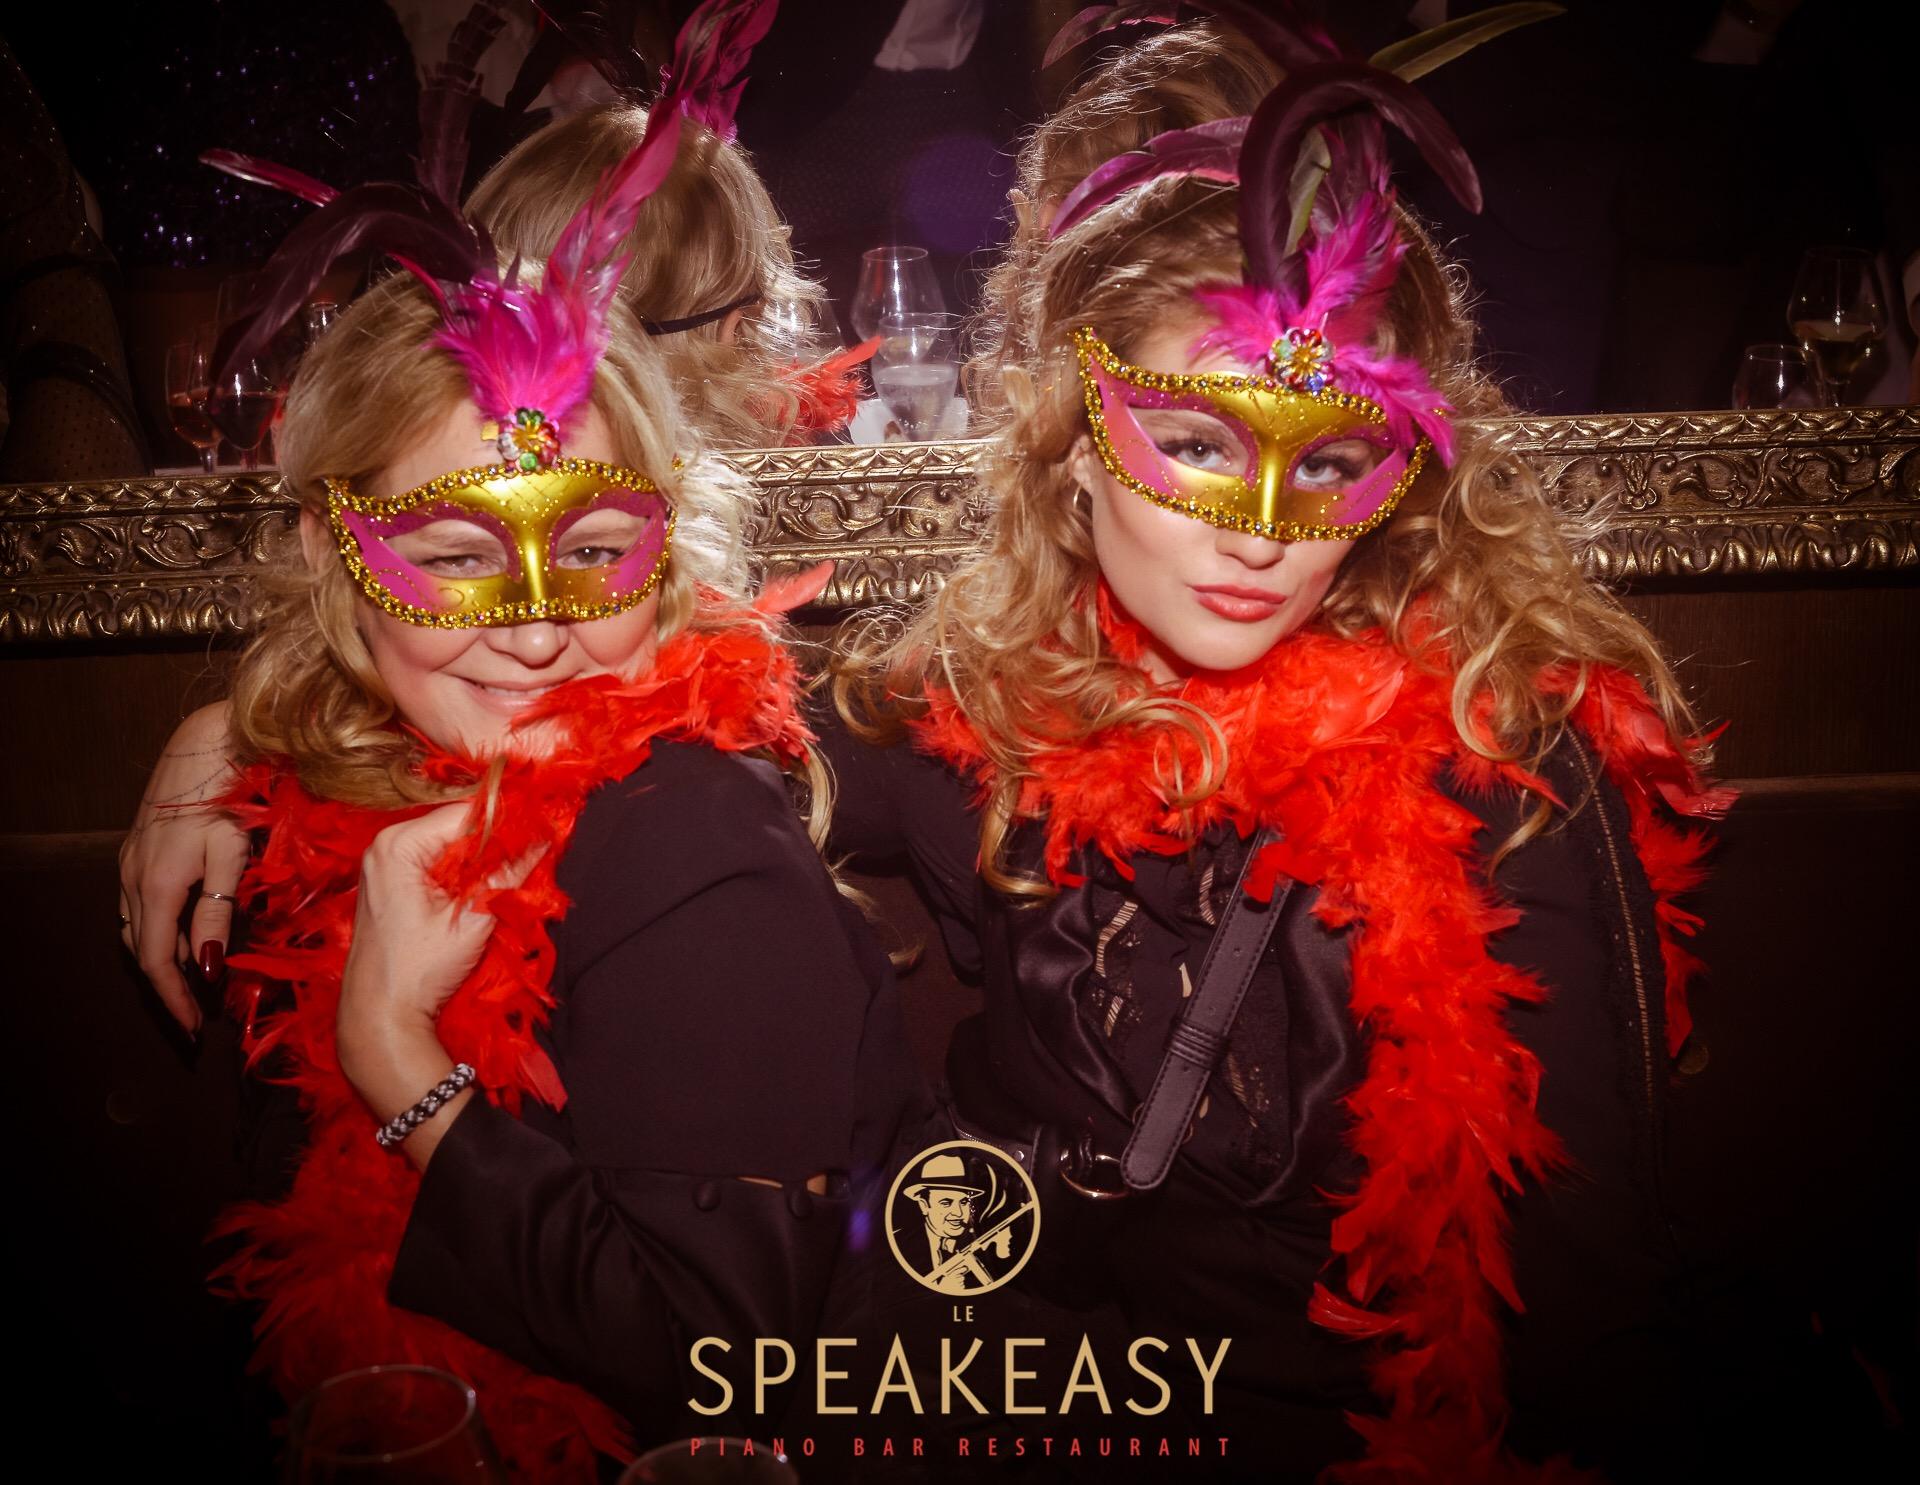 Le Speakeasy New Year's Eve